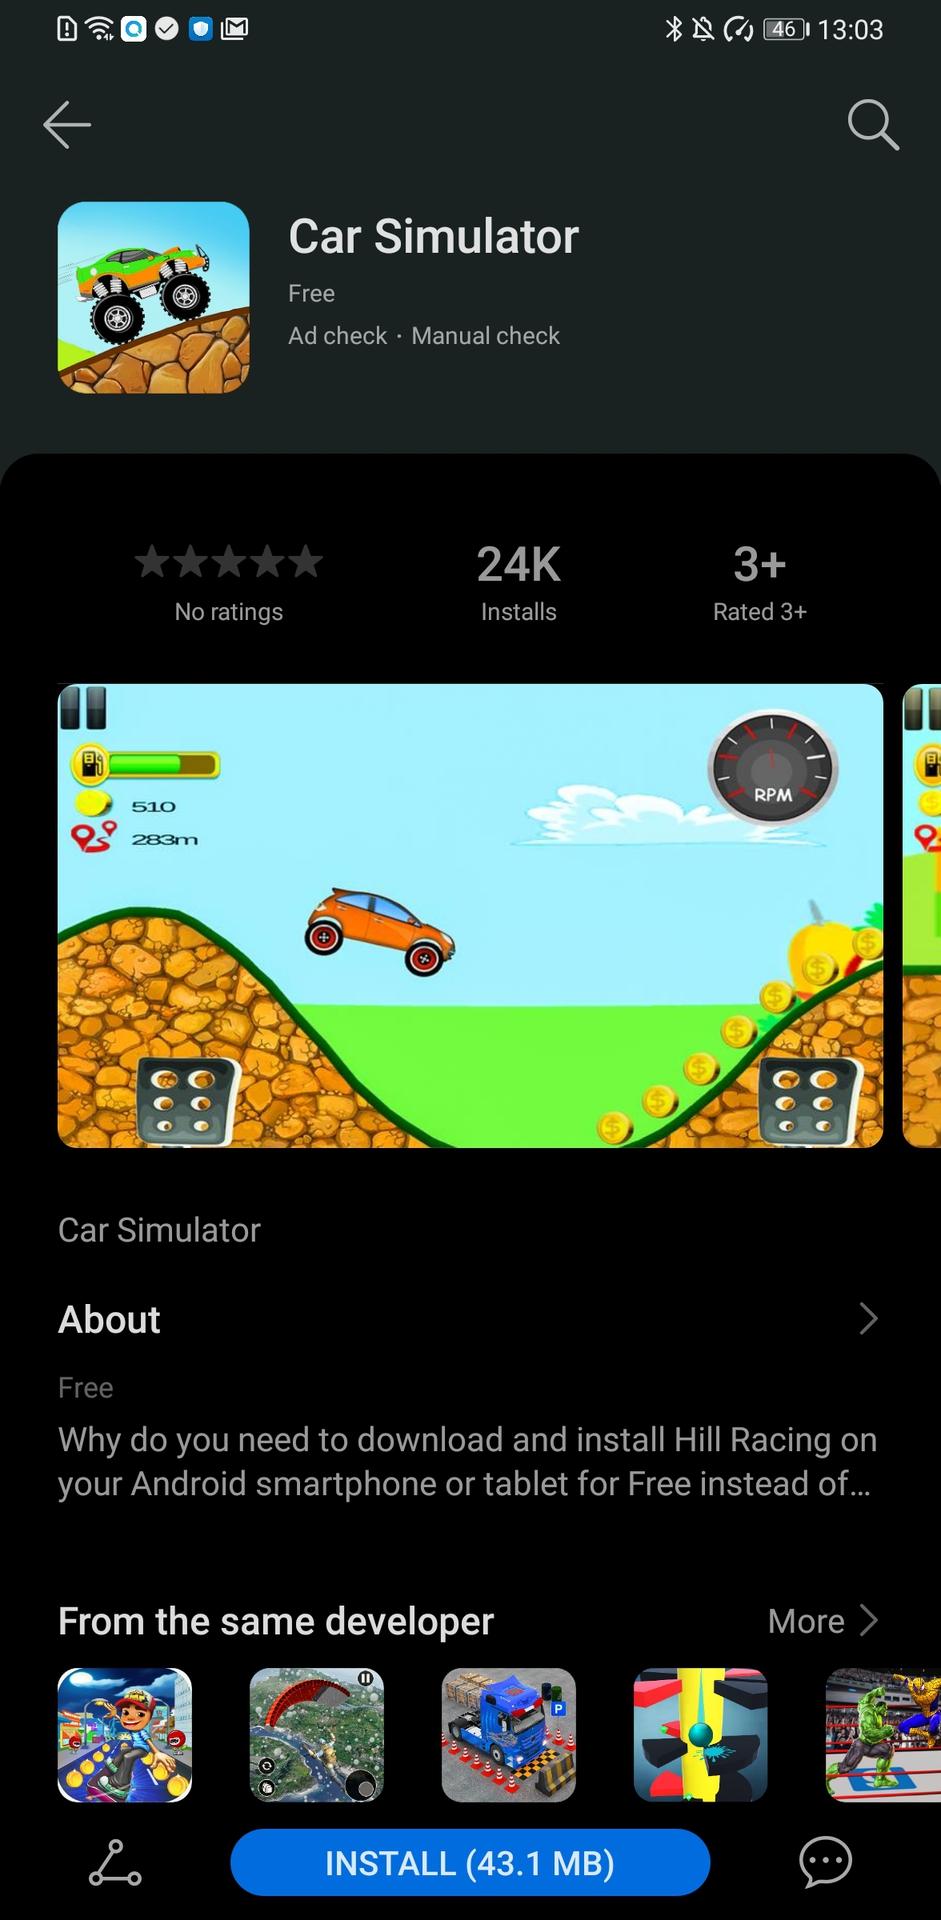 App Gallery app page